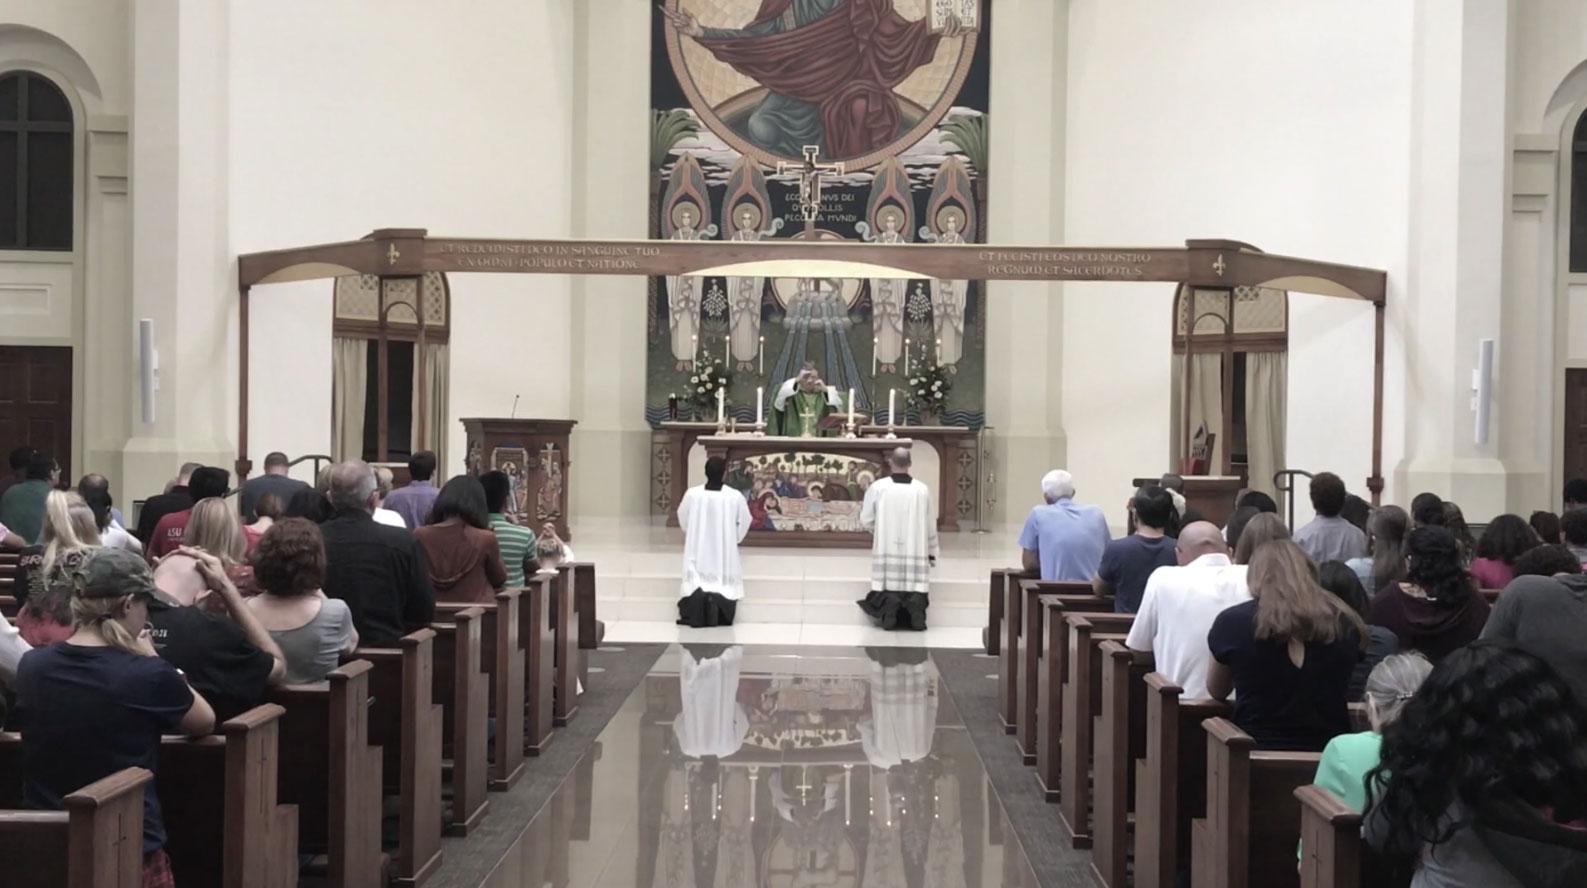 Catholic Church Website Design and Maintenance - The